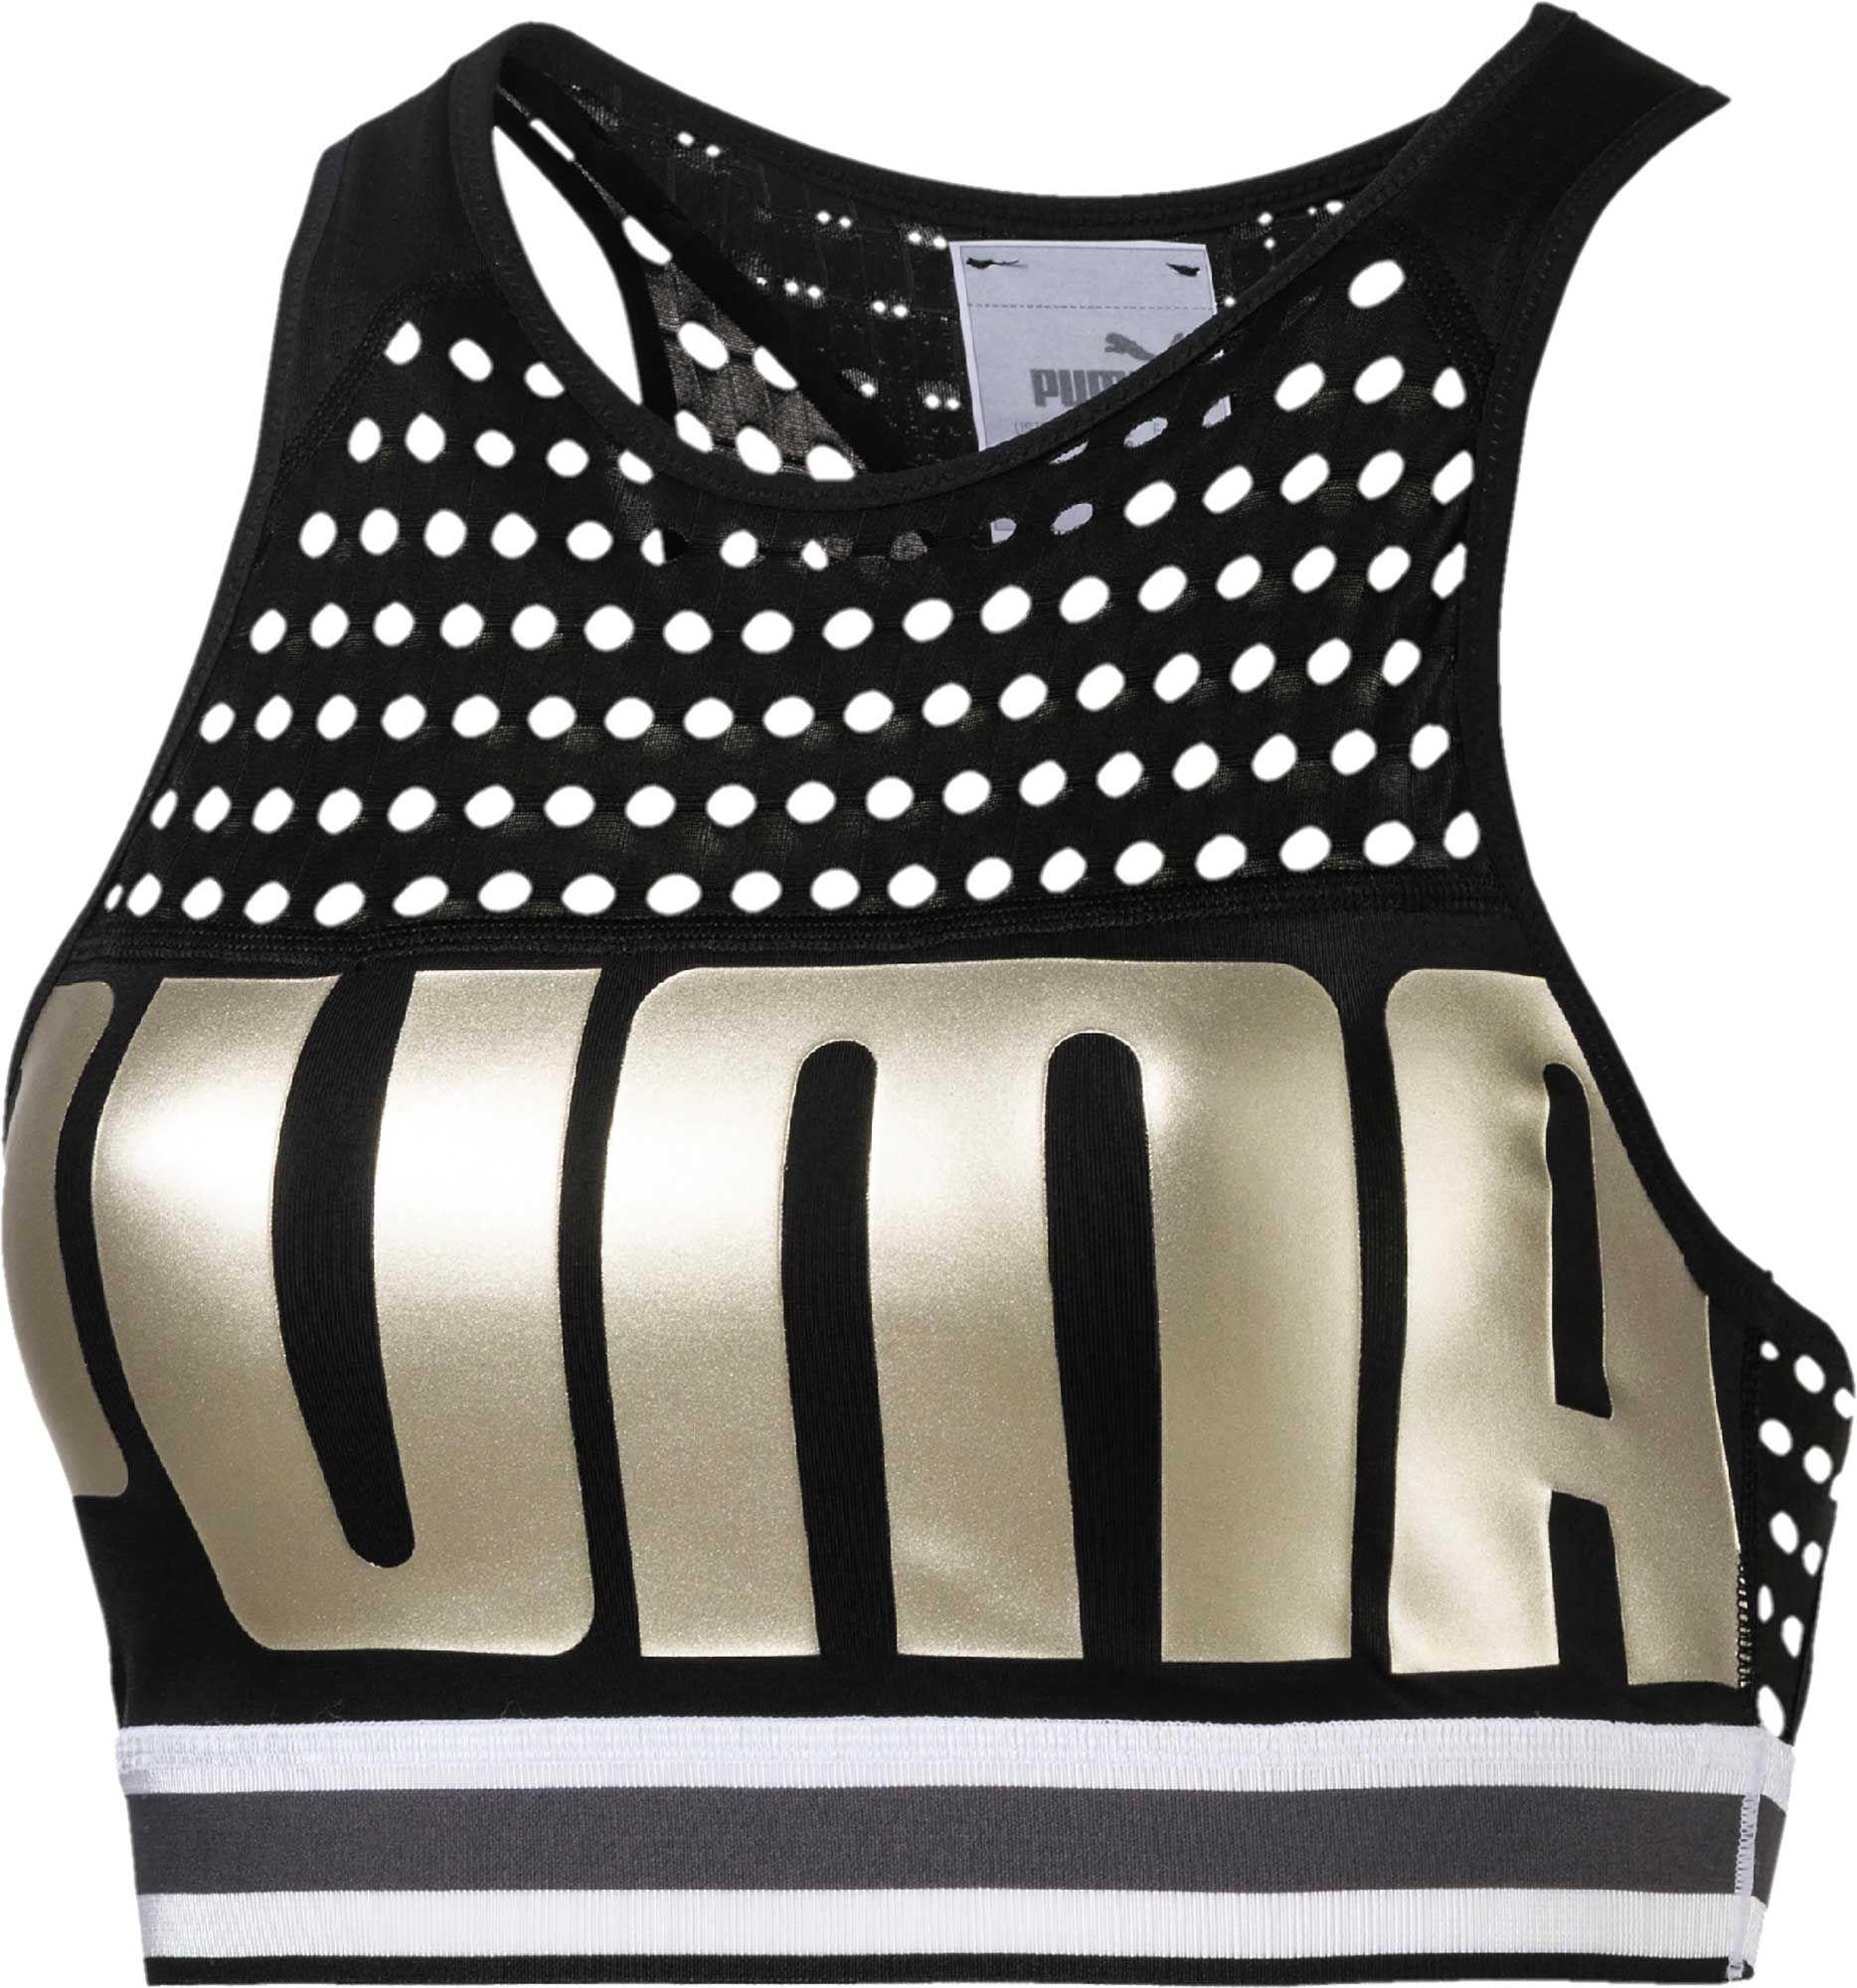 Puma Women's Graphic Sports Bra, Black | Medium support